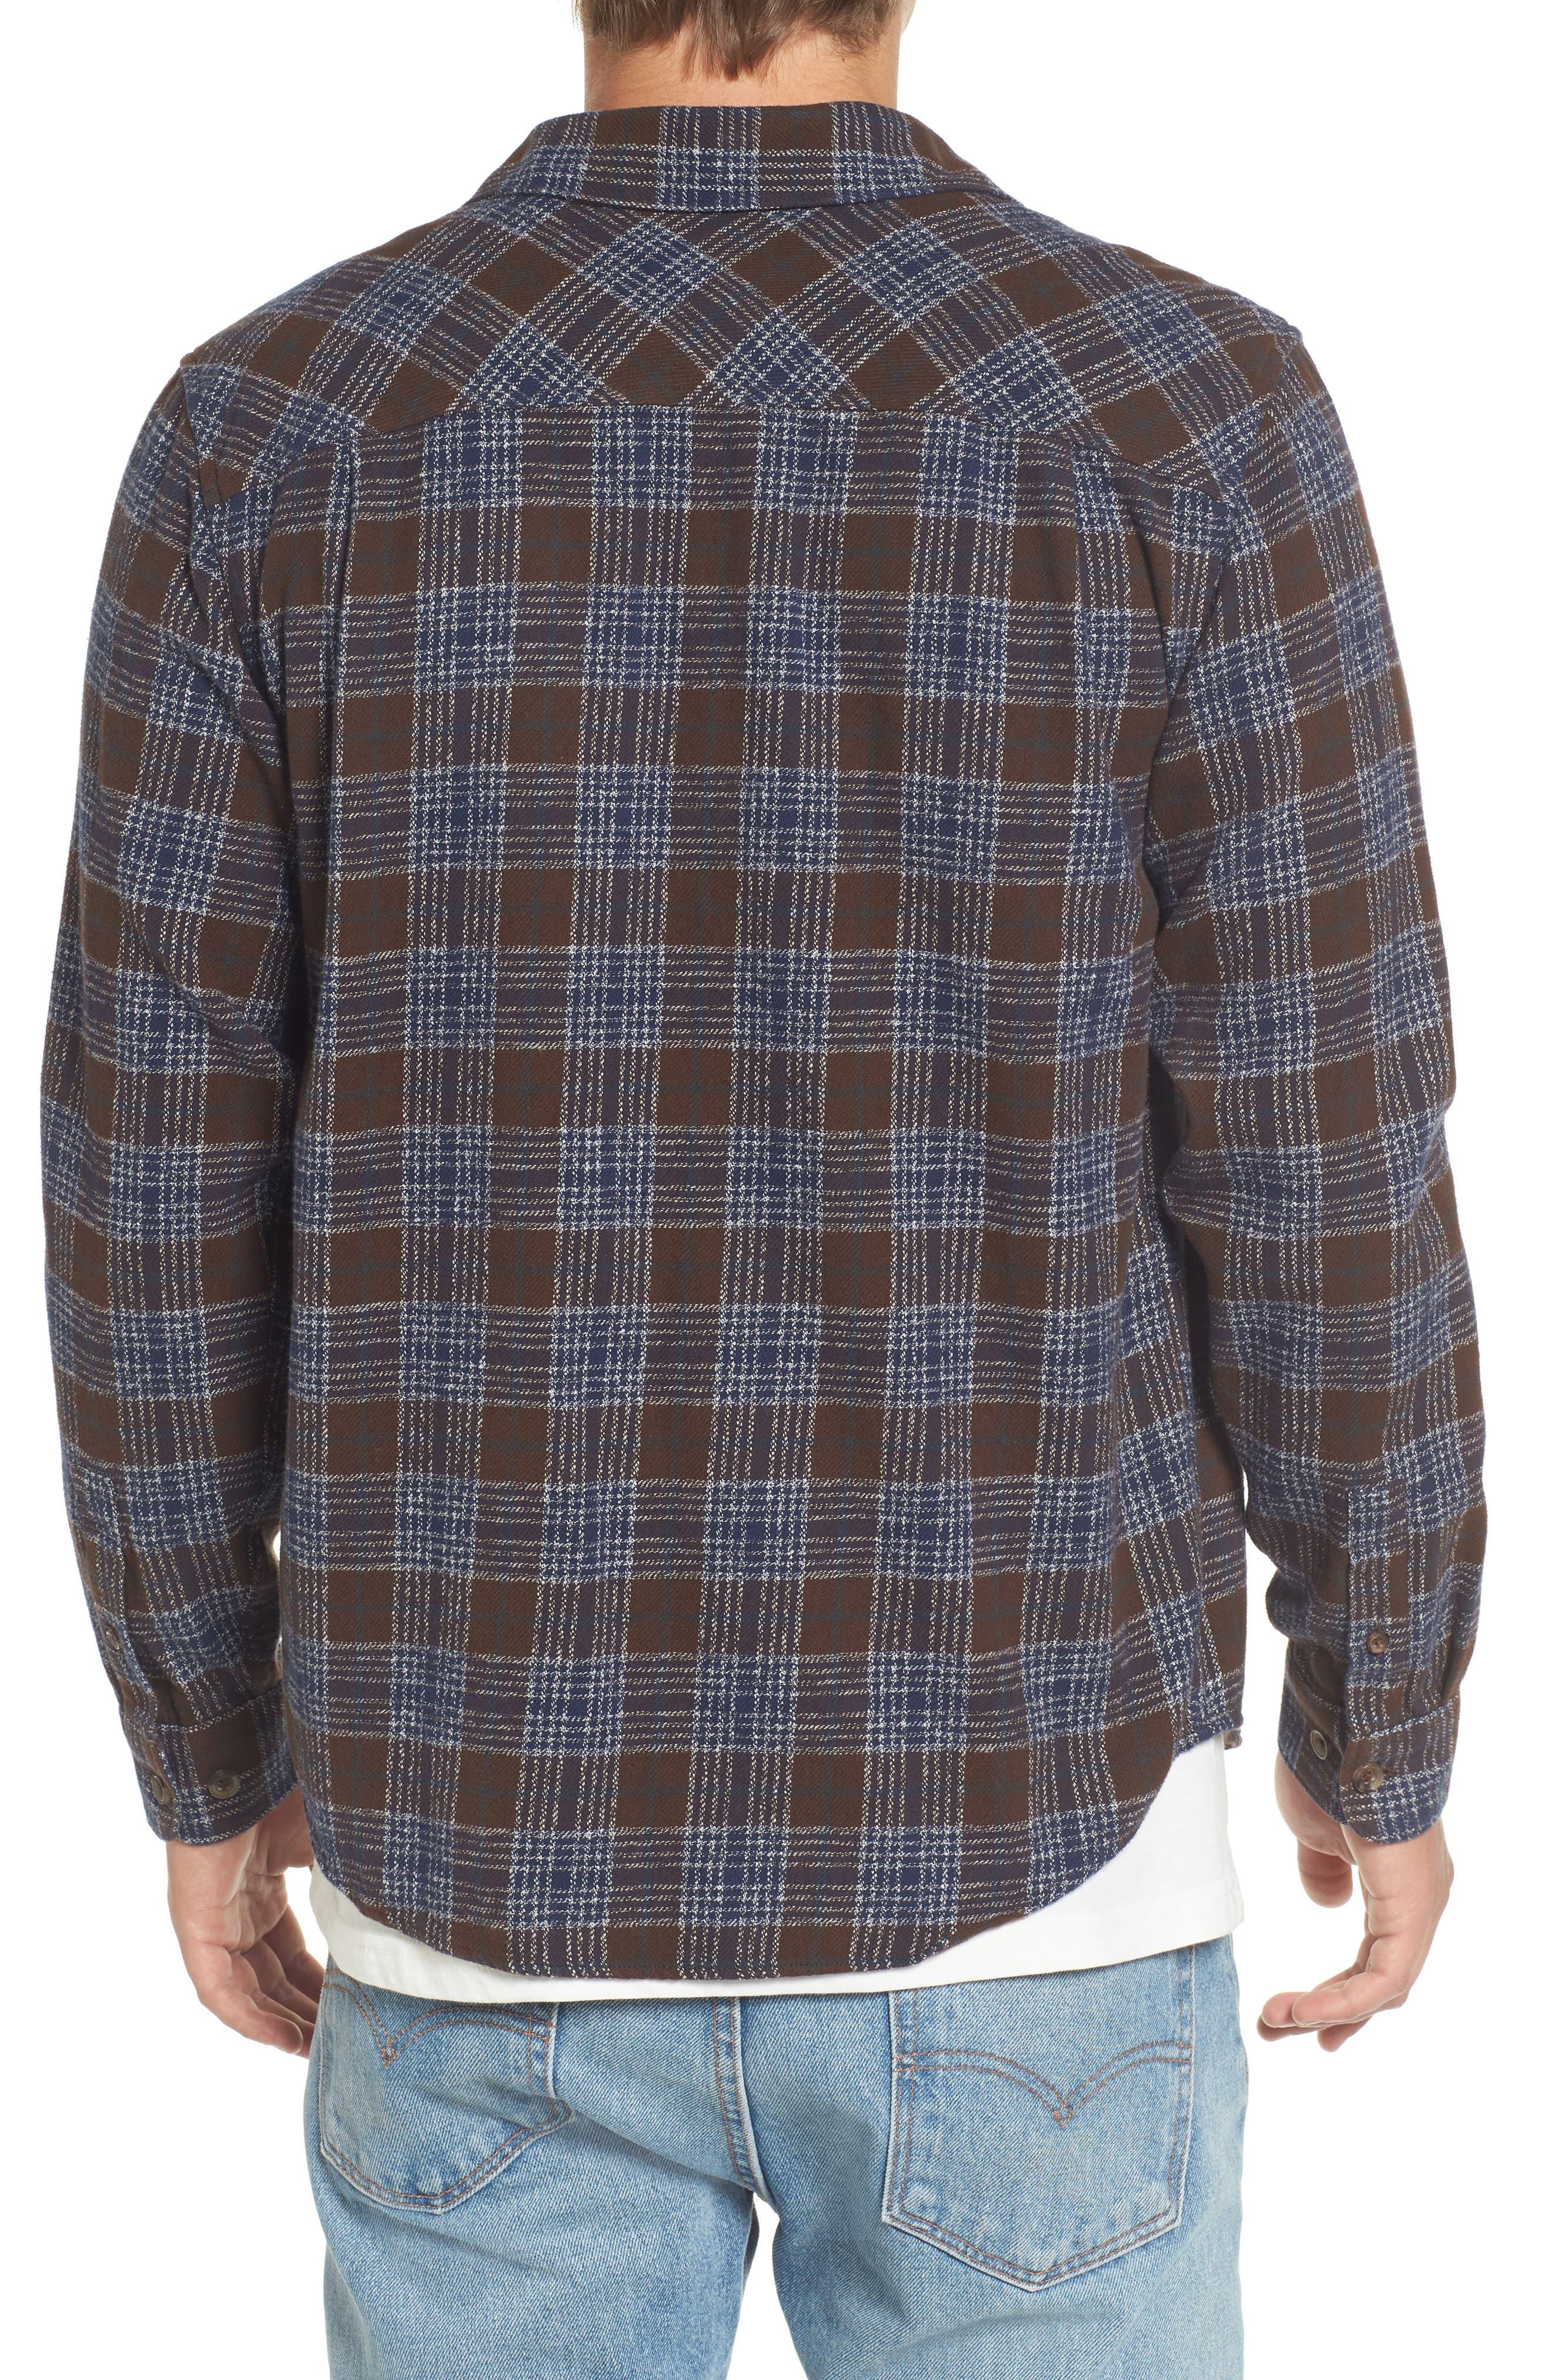 'That'll Work' Trim Fit Plaid Flannel Shirt,                             Alternate thumbnail 16, color,